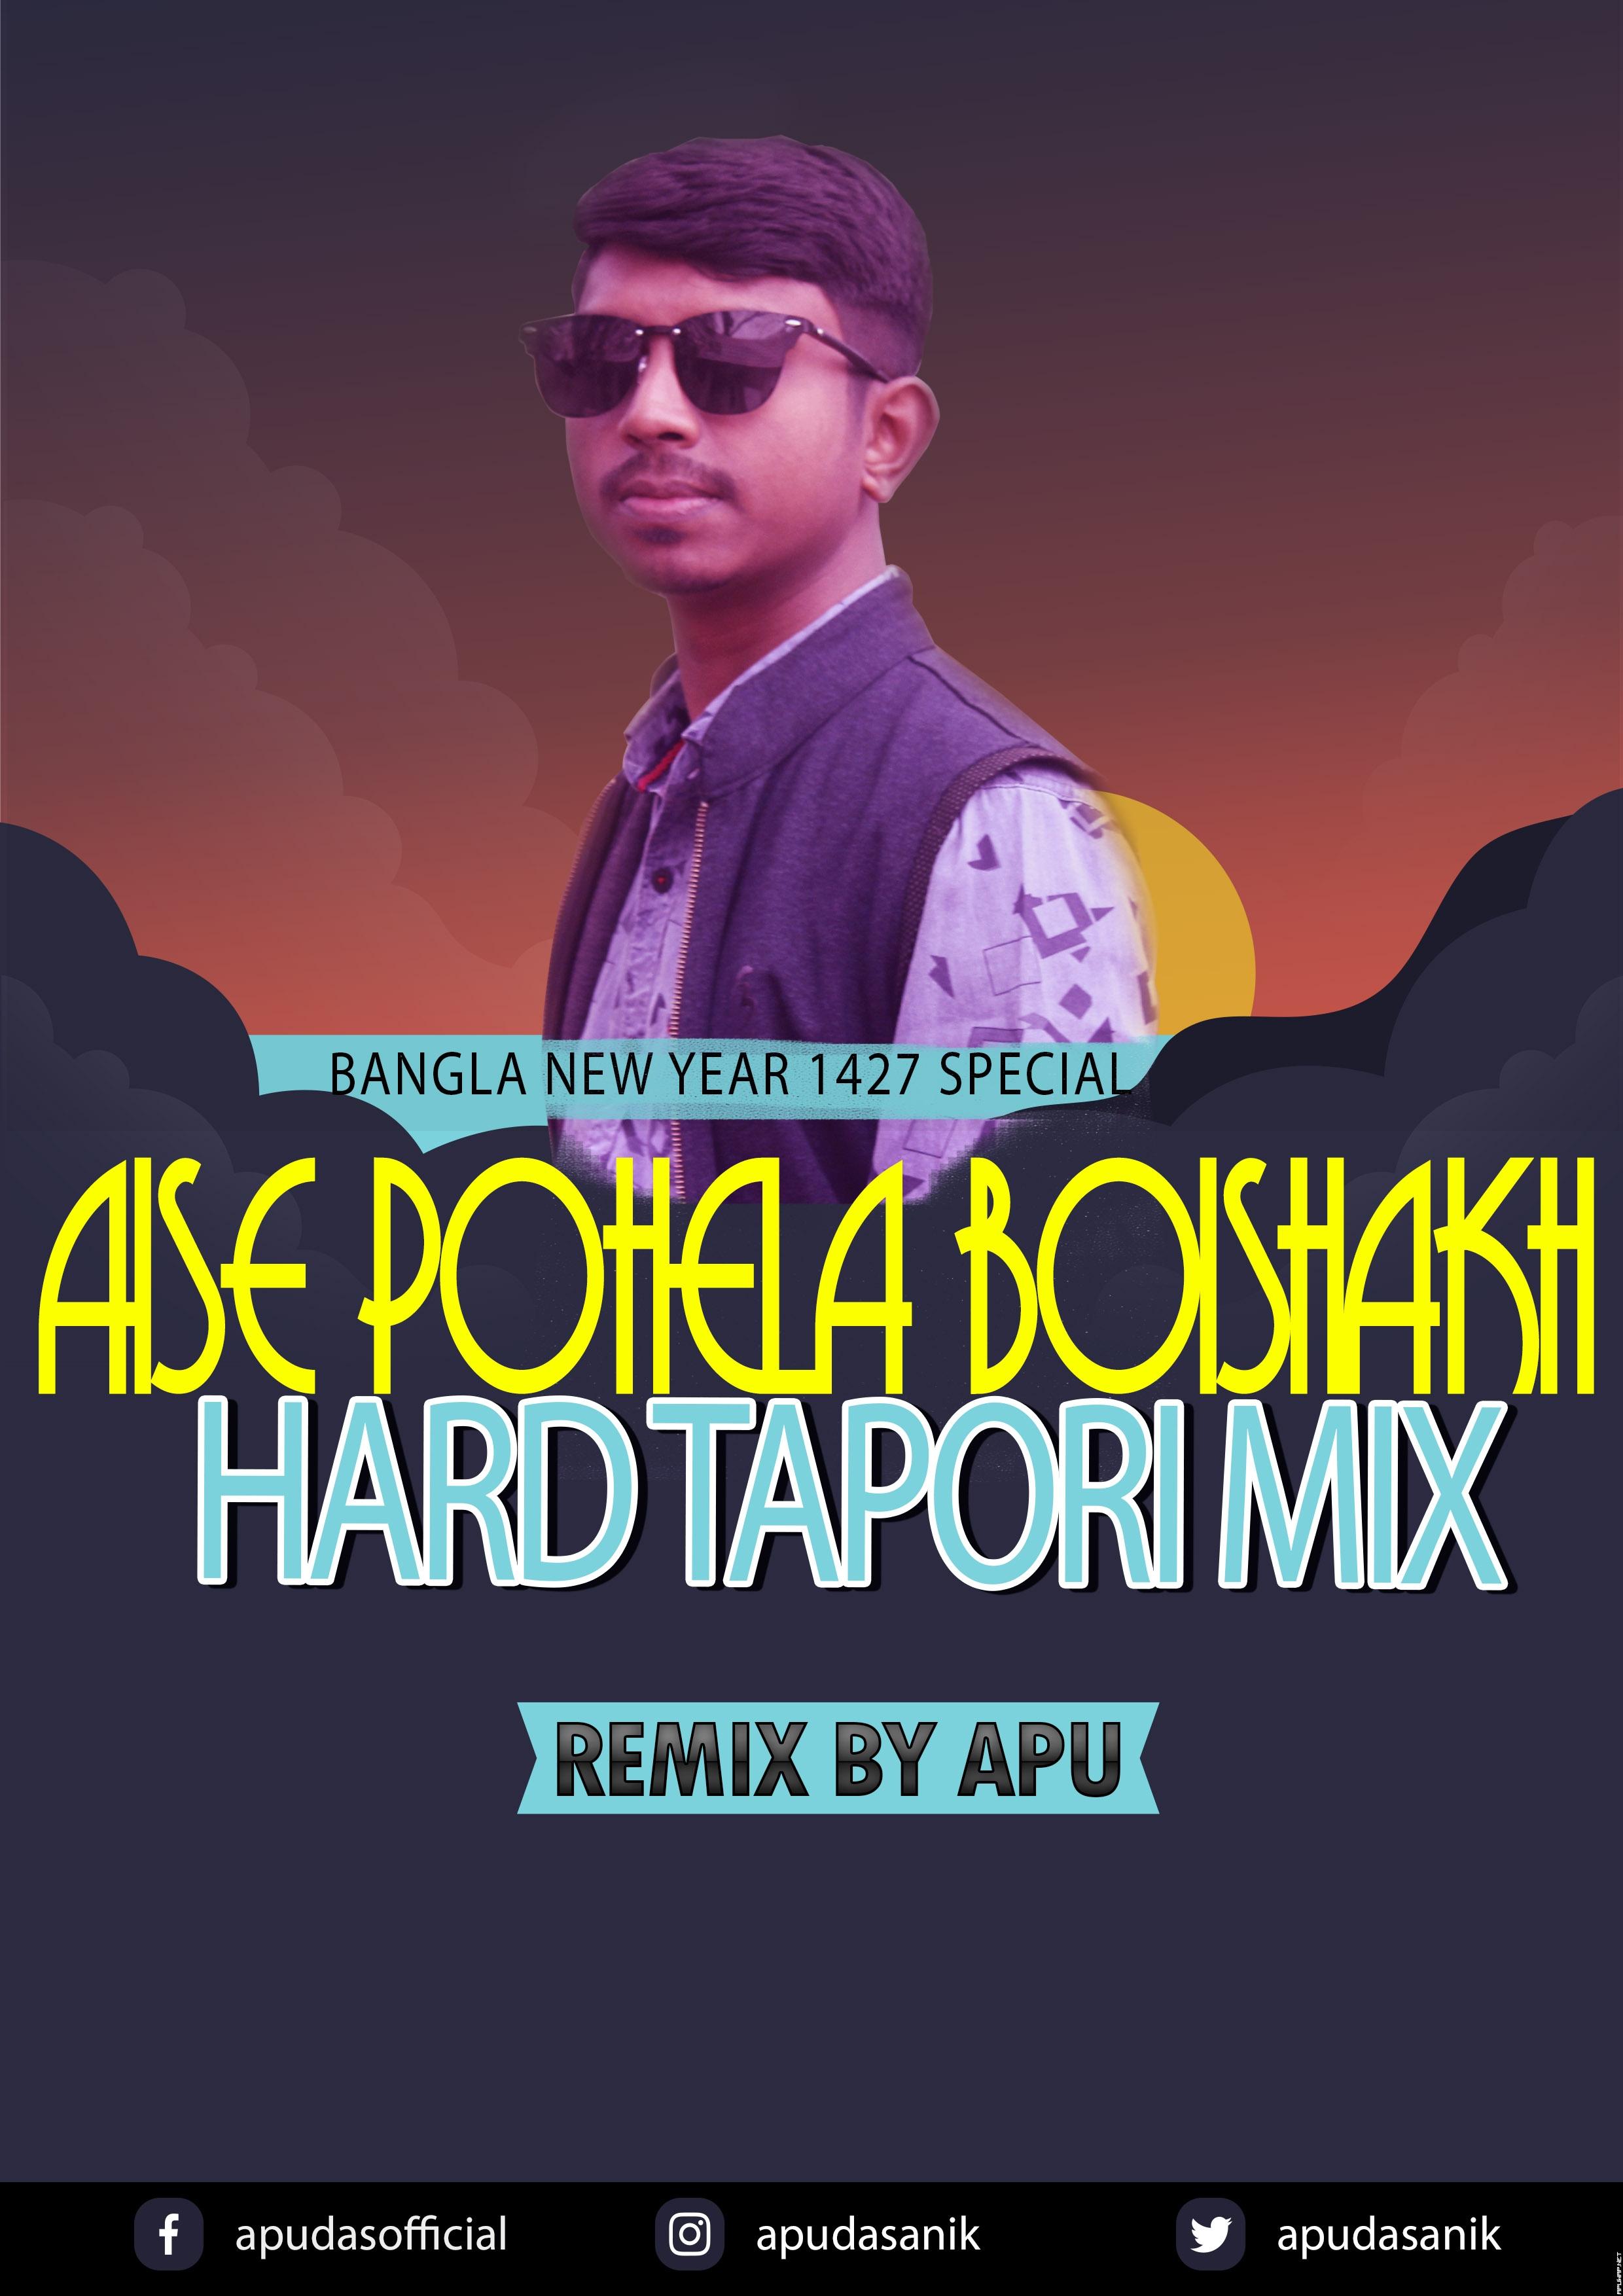 Aise Pohela Boishakh -Hard Tapori Mix By Apu.mp3